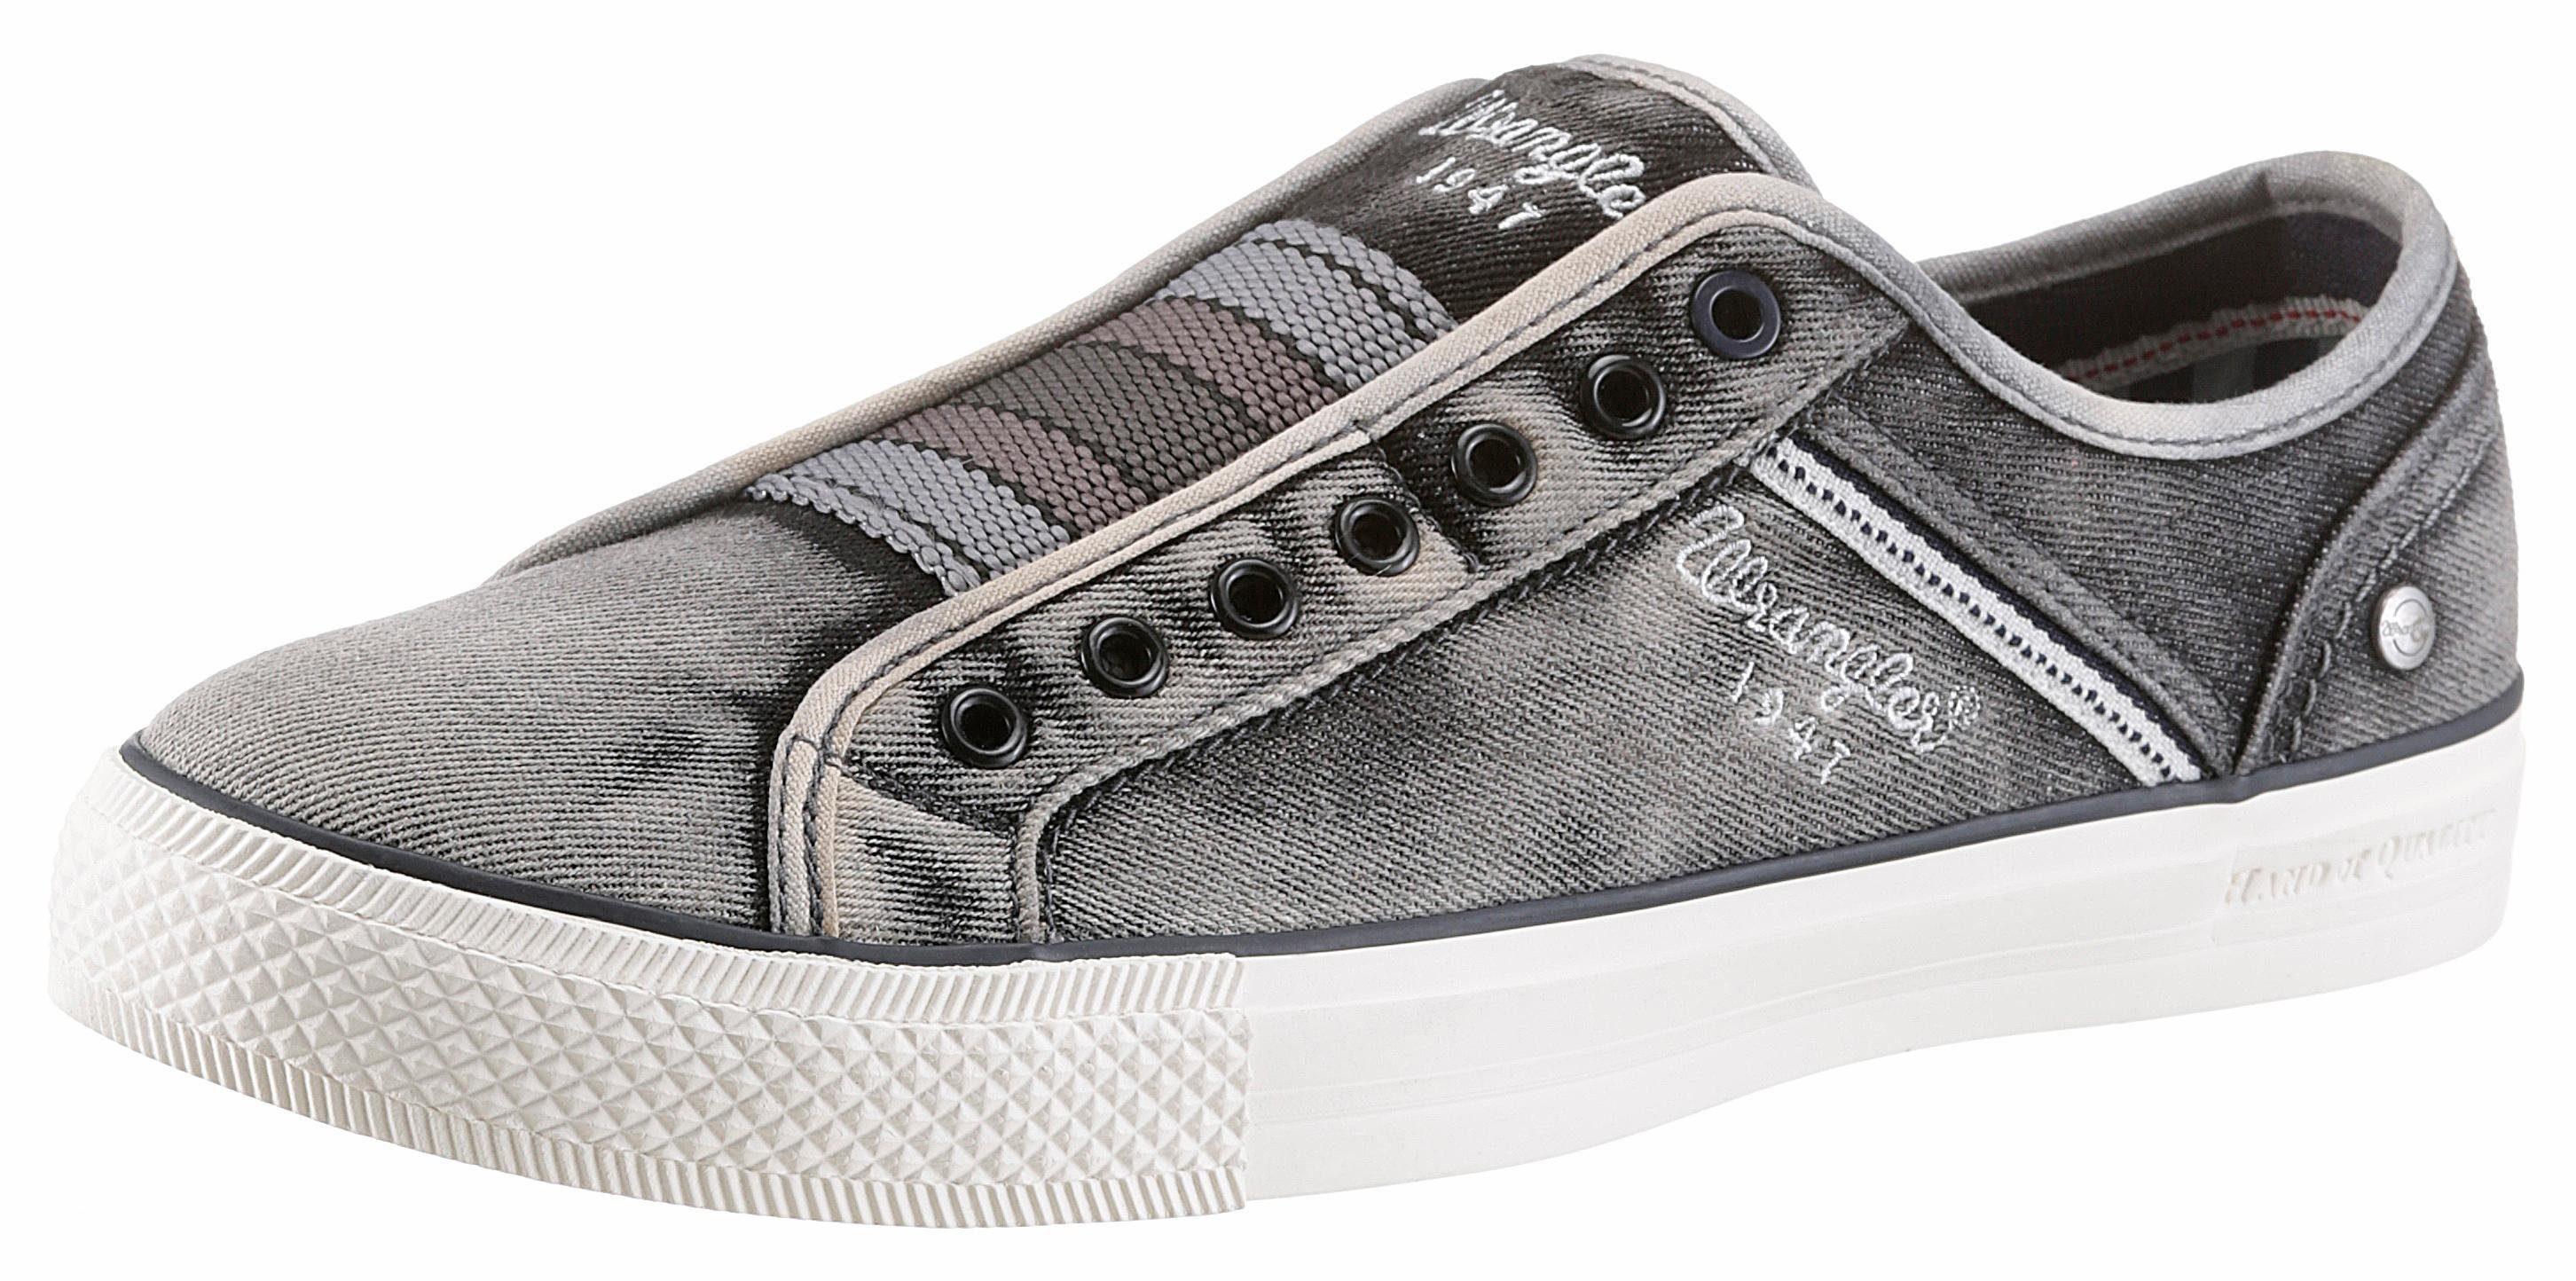 Wrangler »Starry Slip On« Sneaker, mit Ziernähten, grau, 44 44